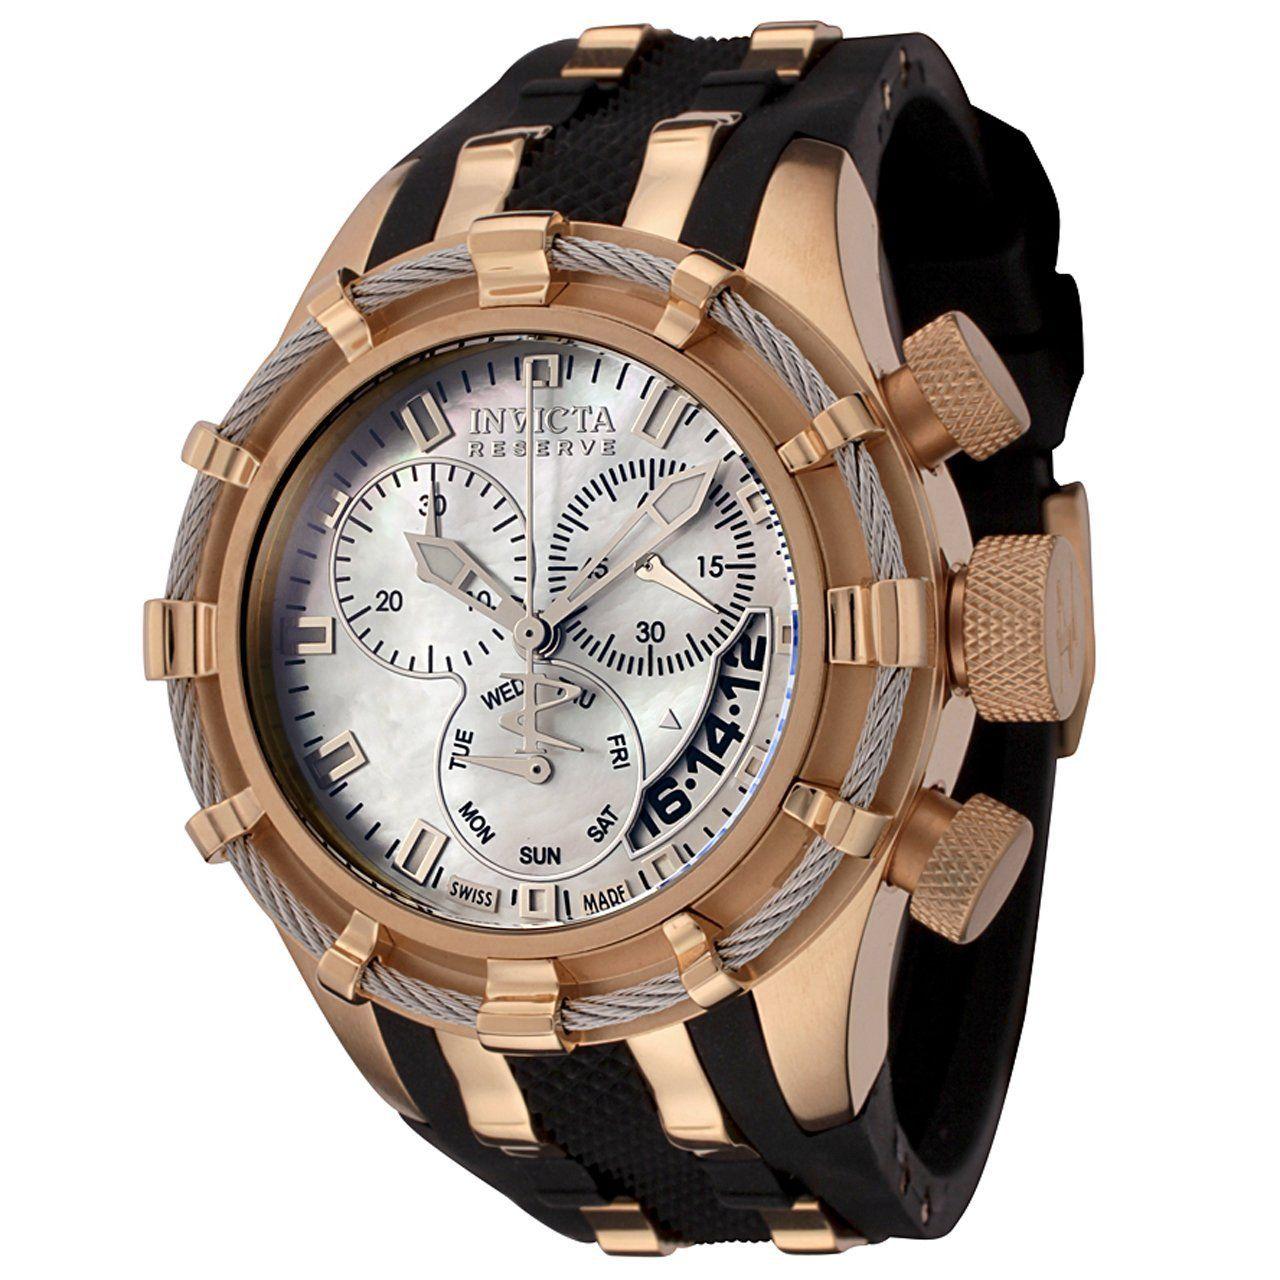 Invicta Watches | Invicta Women's Reserve Bolt Chronograph Watch 6950 | Invicta Watches